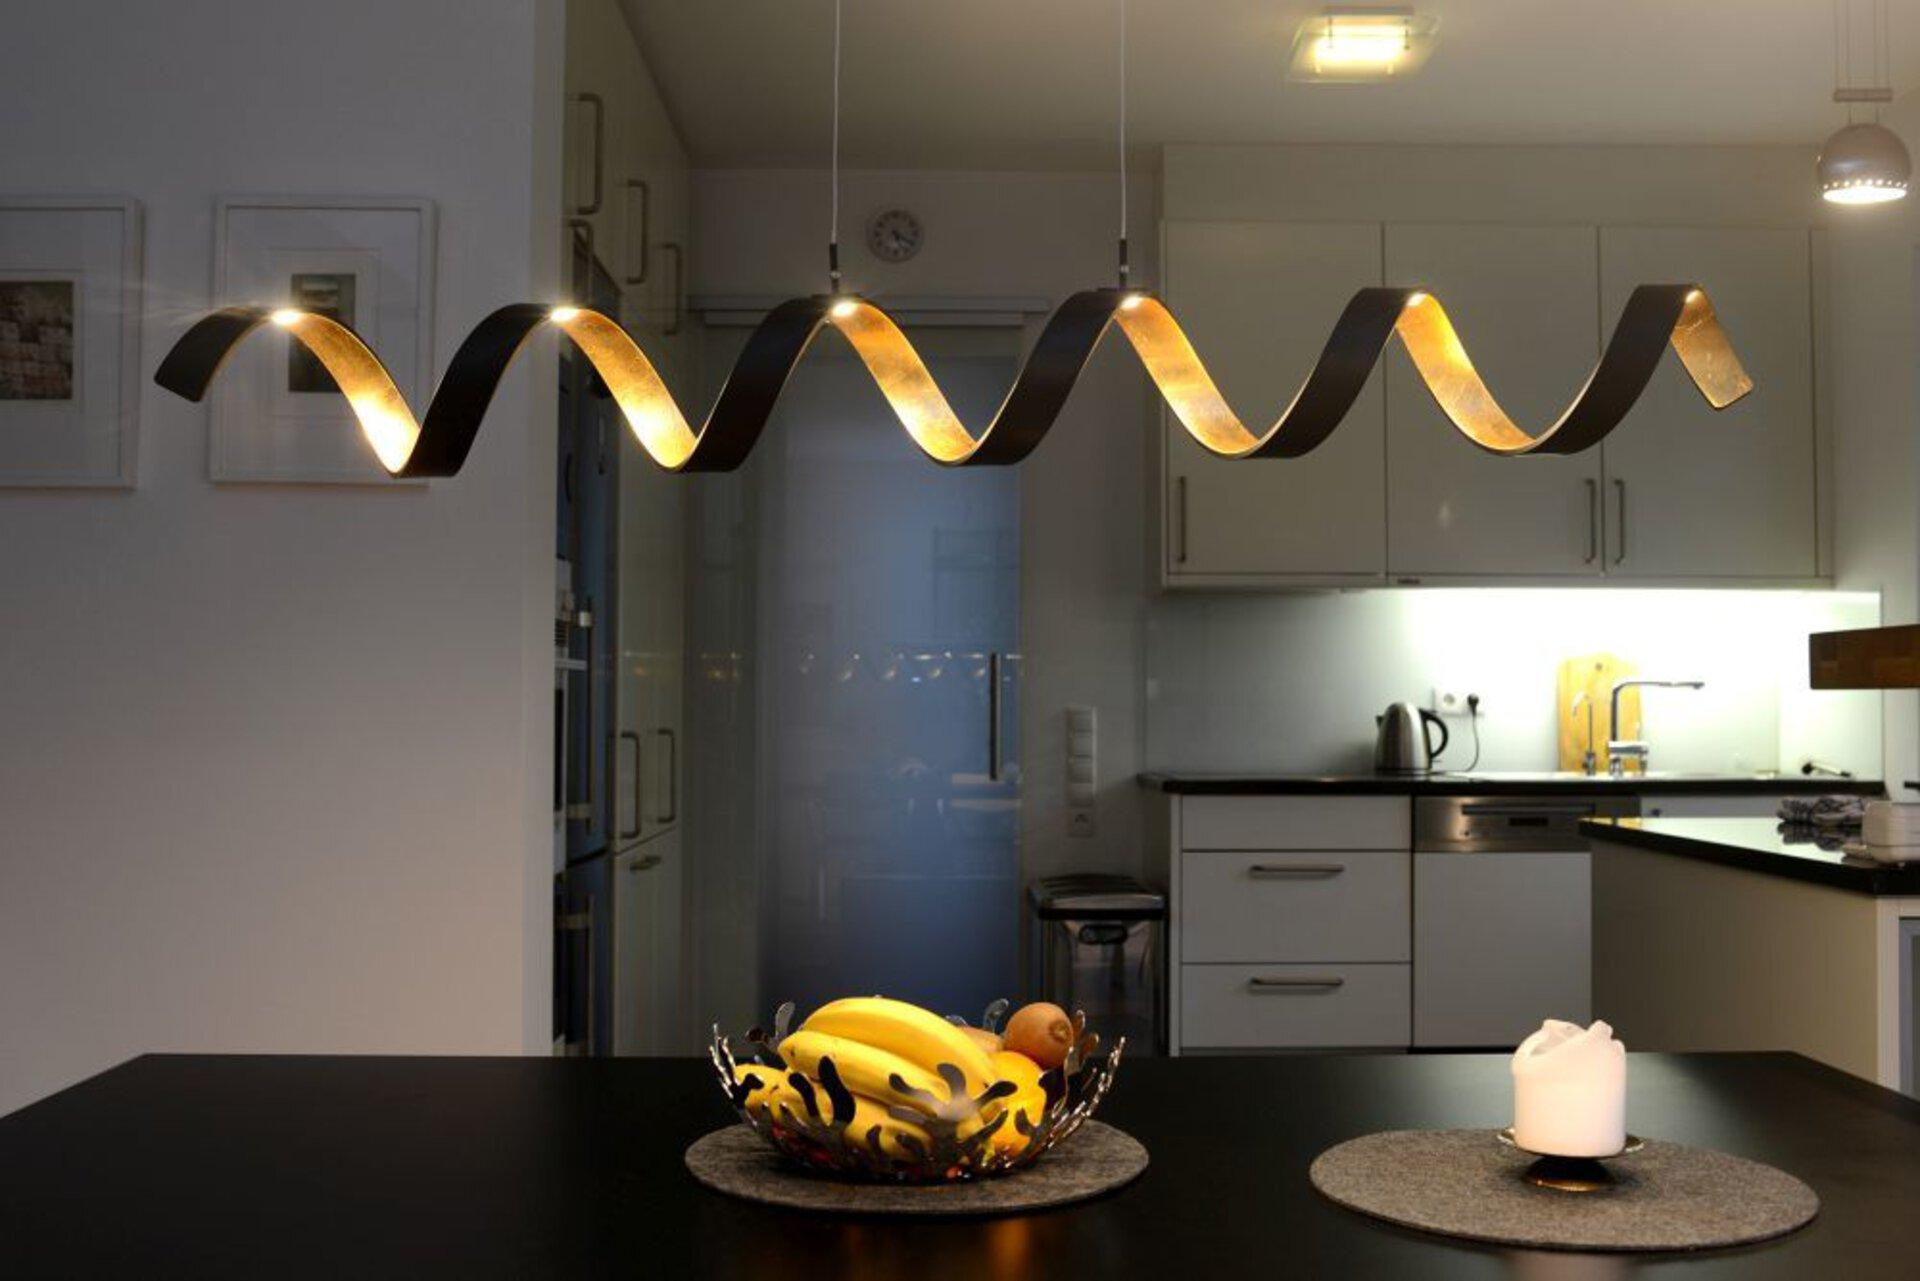 Hängeleuchte Helix LED-Helix-S6 Eco-Light Metall schwarz 13 x 120 x 125 cm